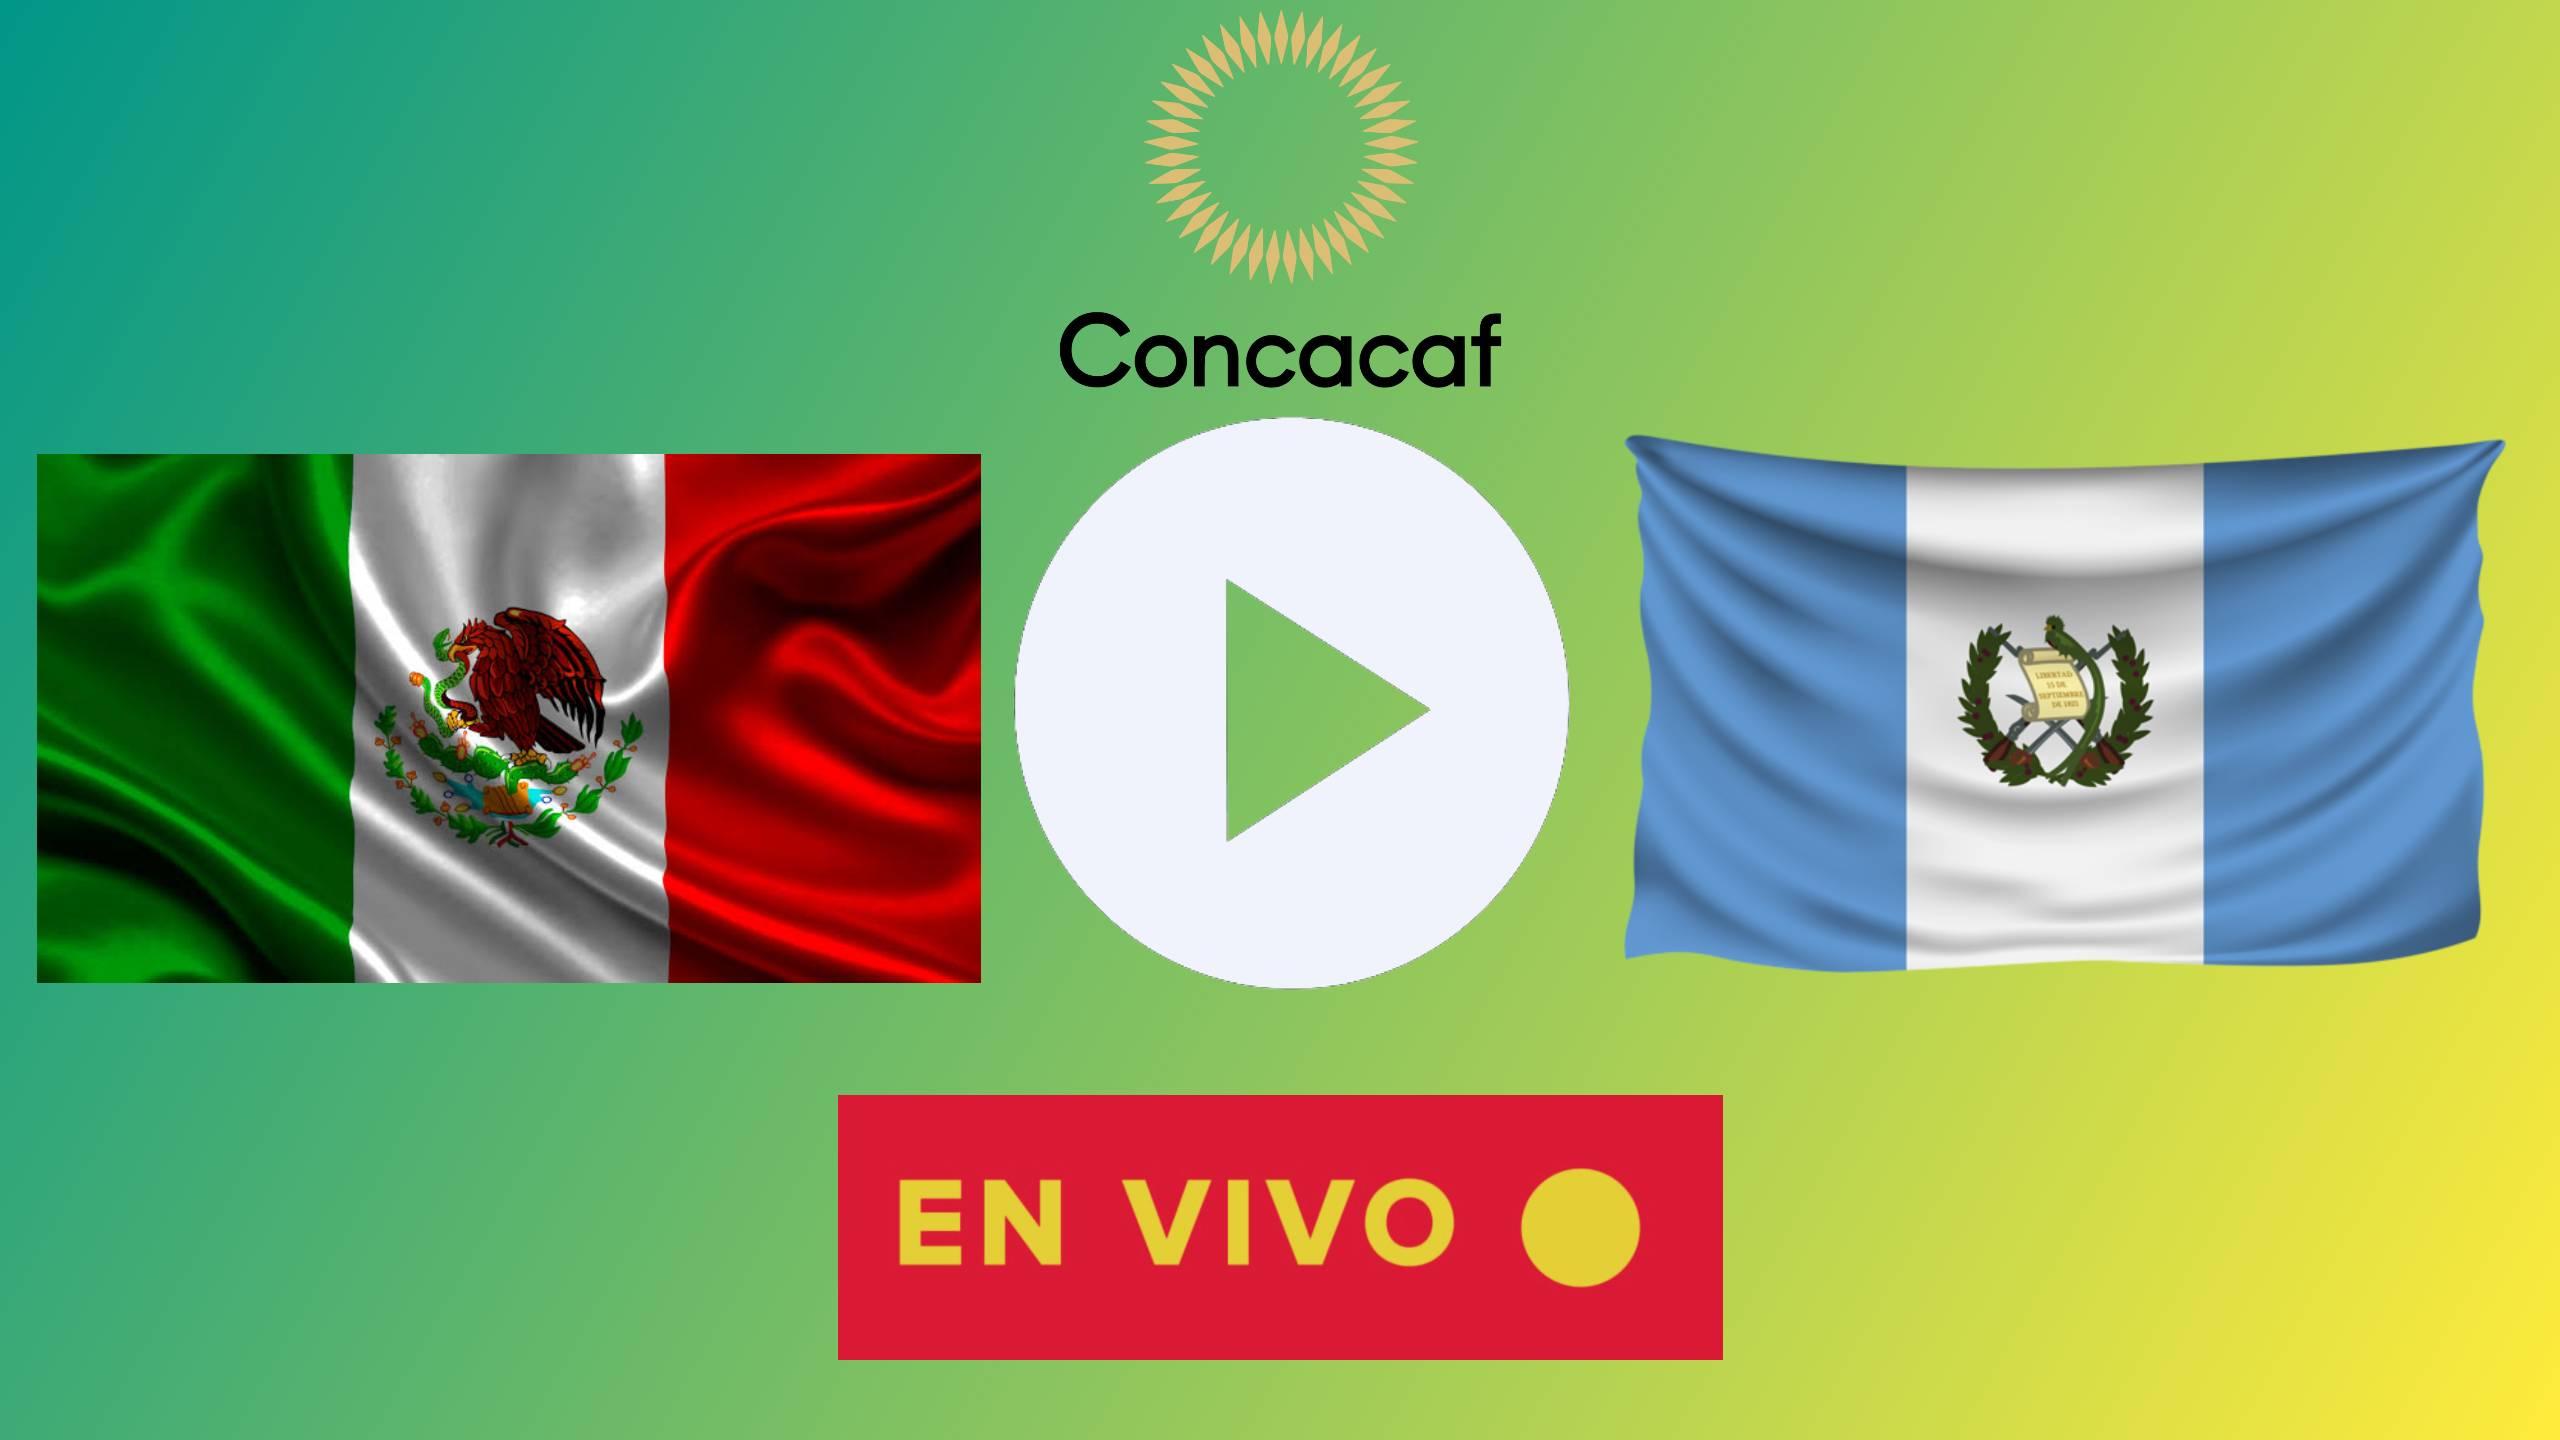 EN VIVO México vs Guatemala hoy EN DIRECTO ONLINE